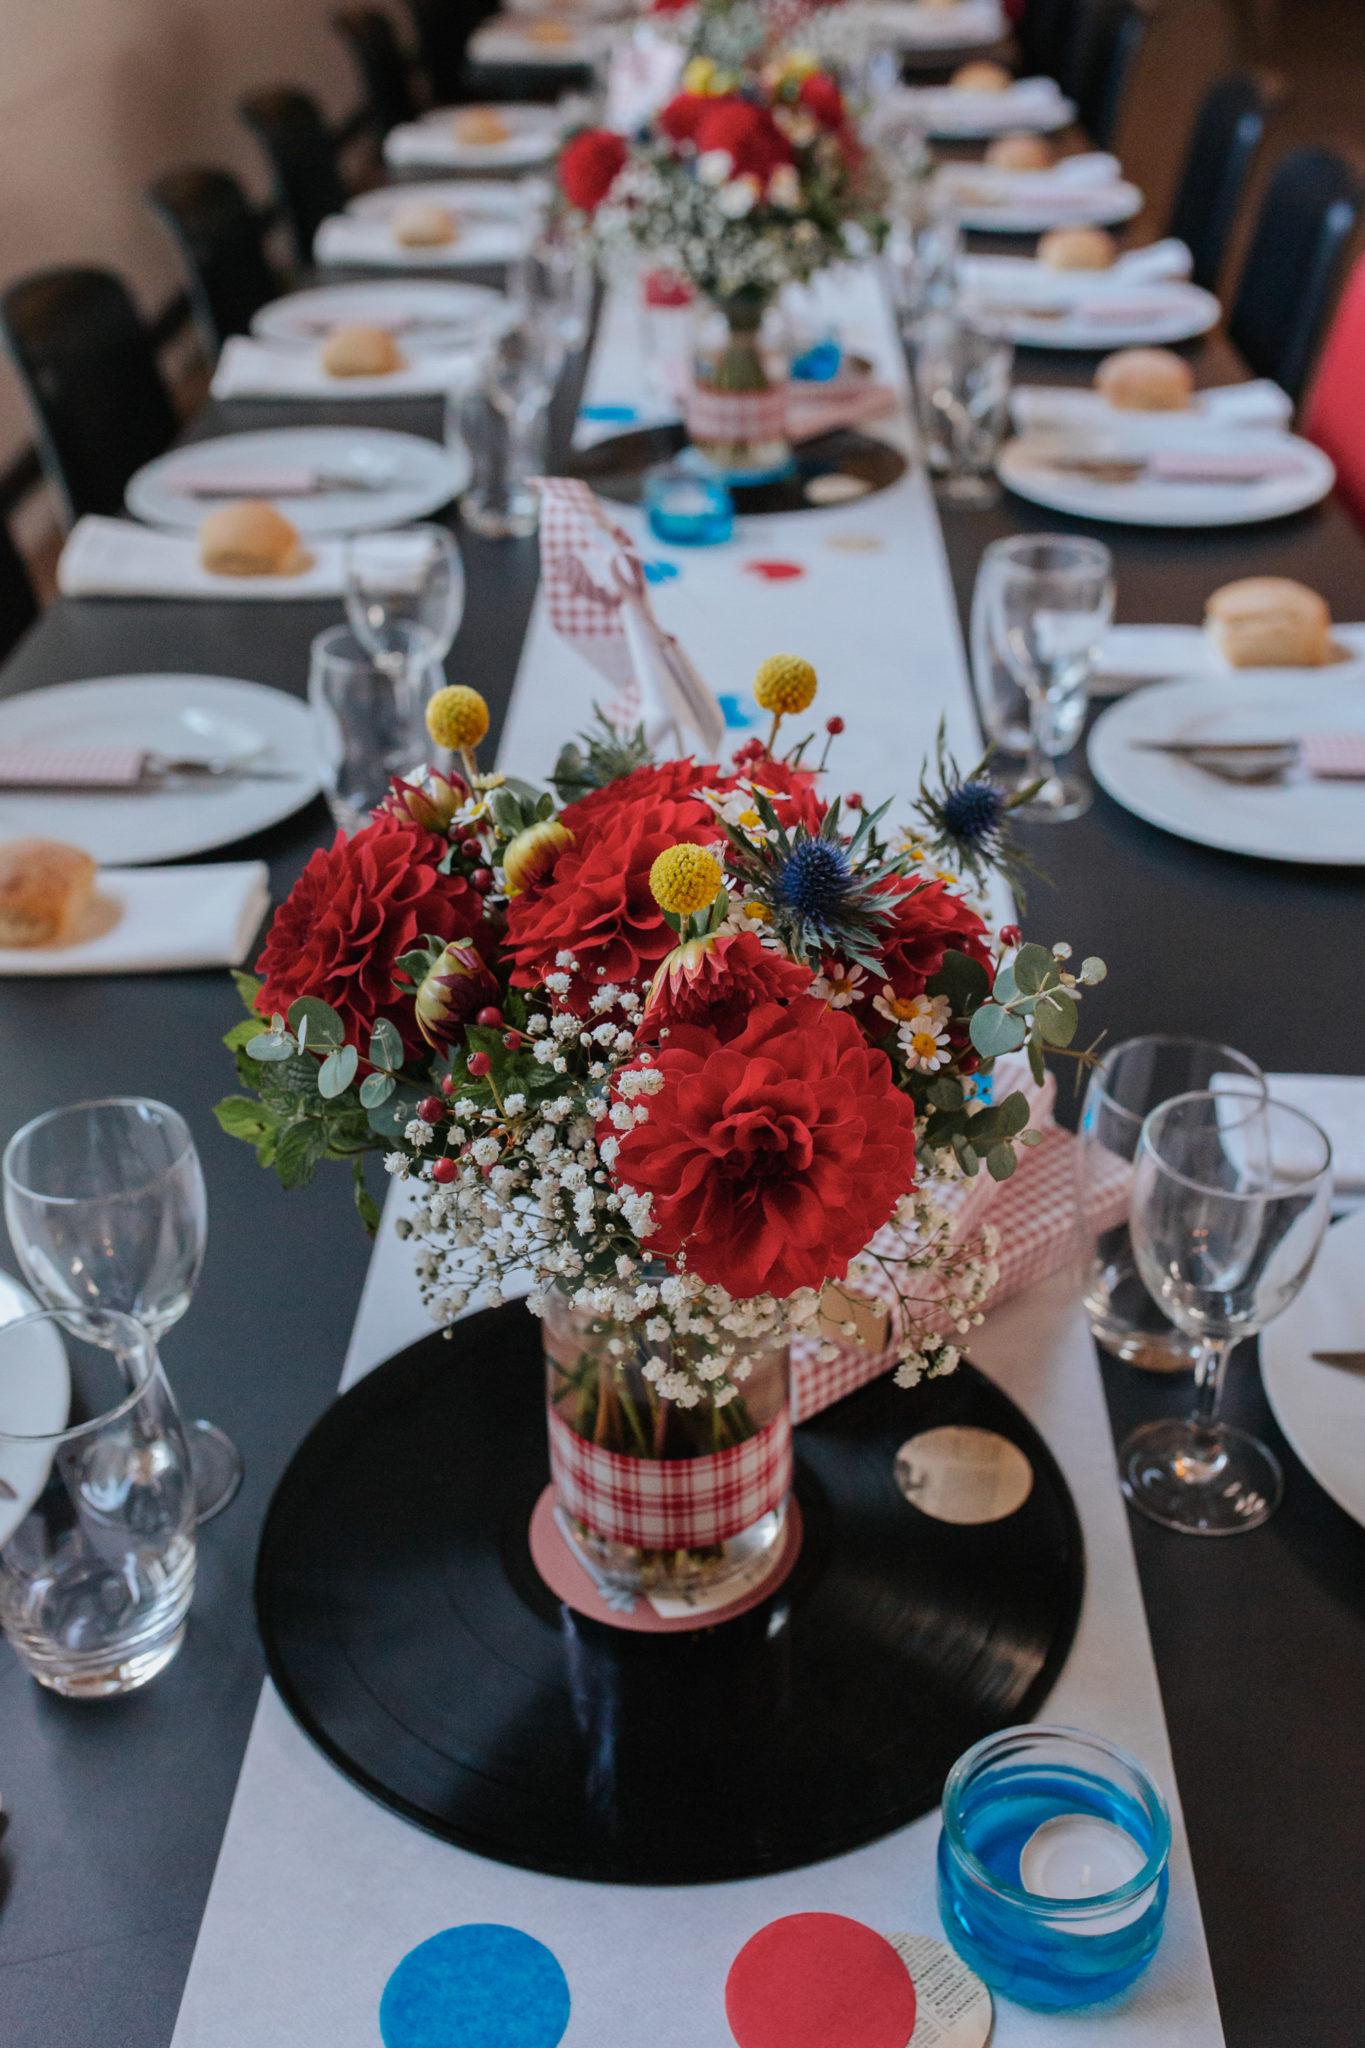 Décoration table DIY diner vinyles tricolore bleu blanc rouge Mariage 50s Domaine Mauvoisin Lommoye